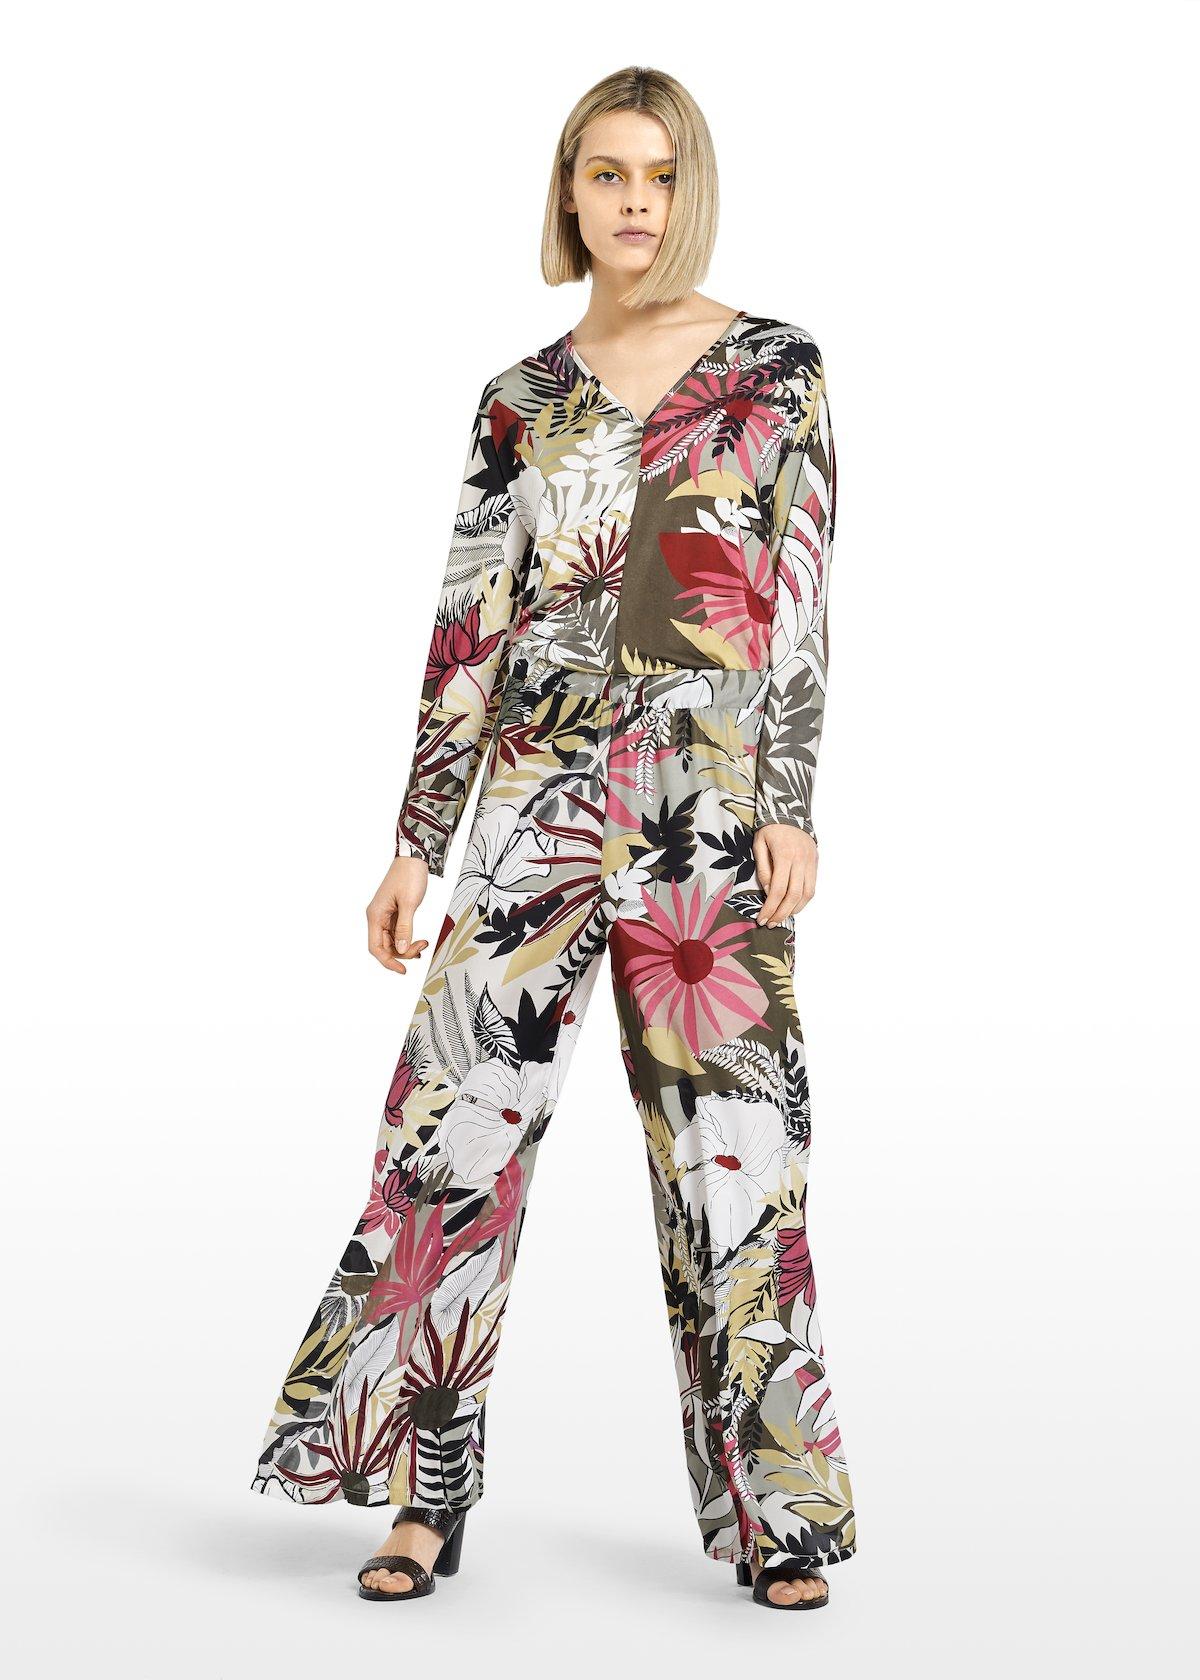 Bali print Simona t-shirt - Alga / White Fantasia - Woman